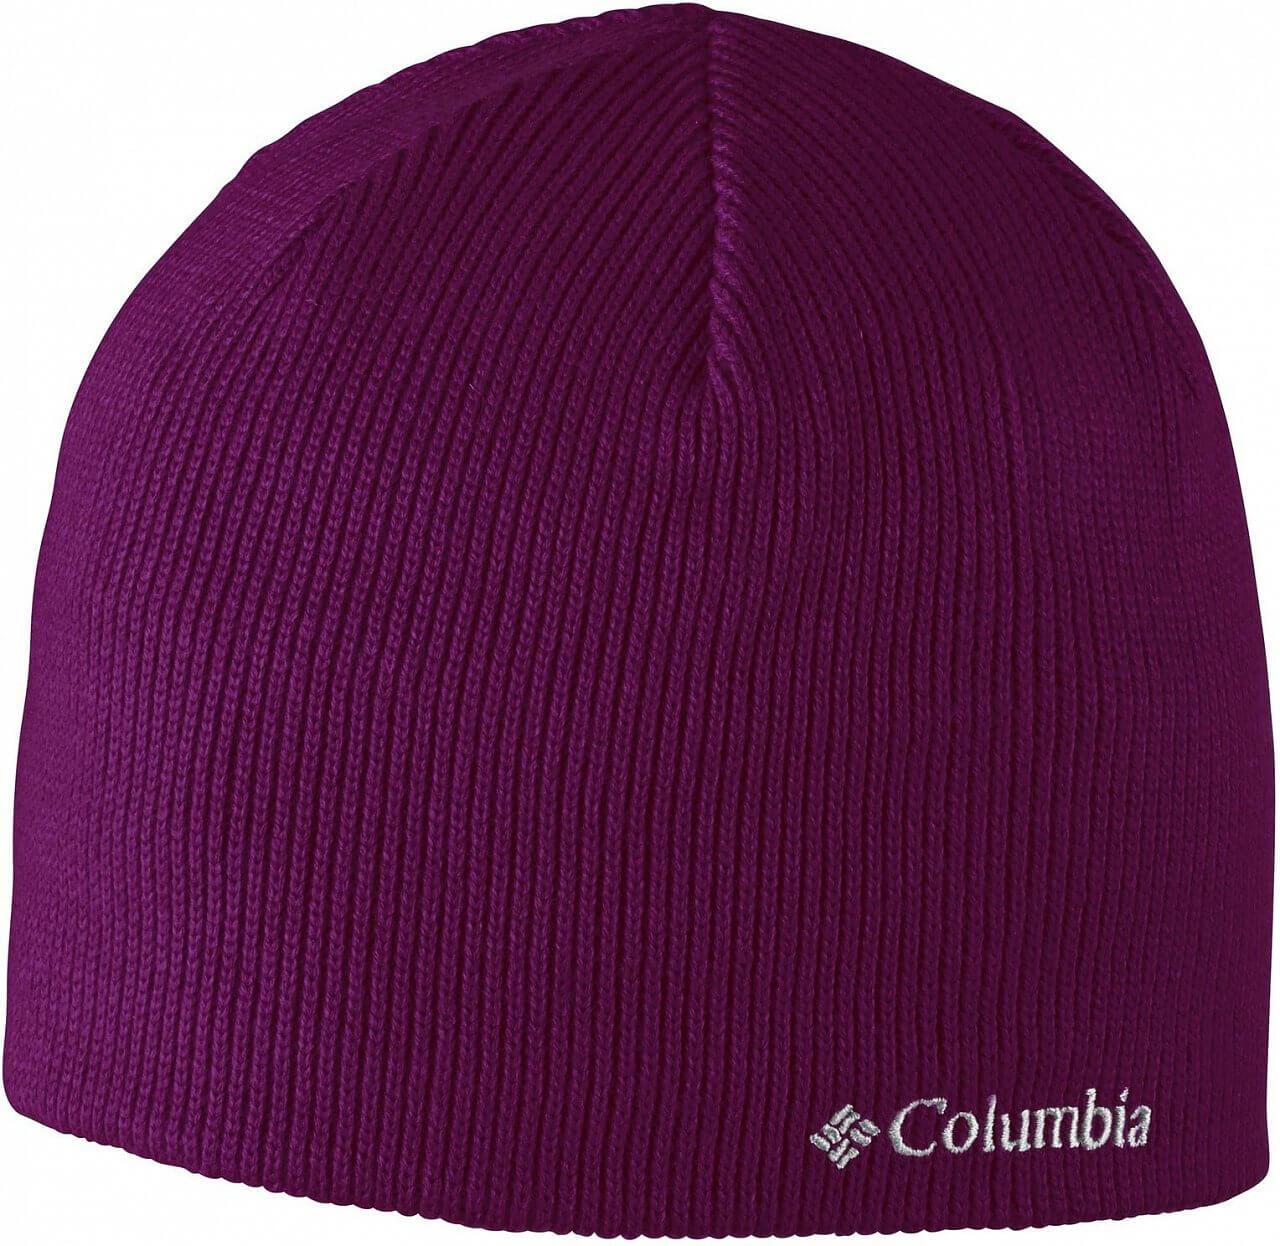 Unisex čepice Columbia Bugaboo Beanie